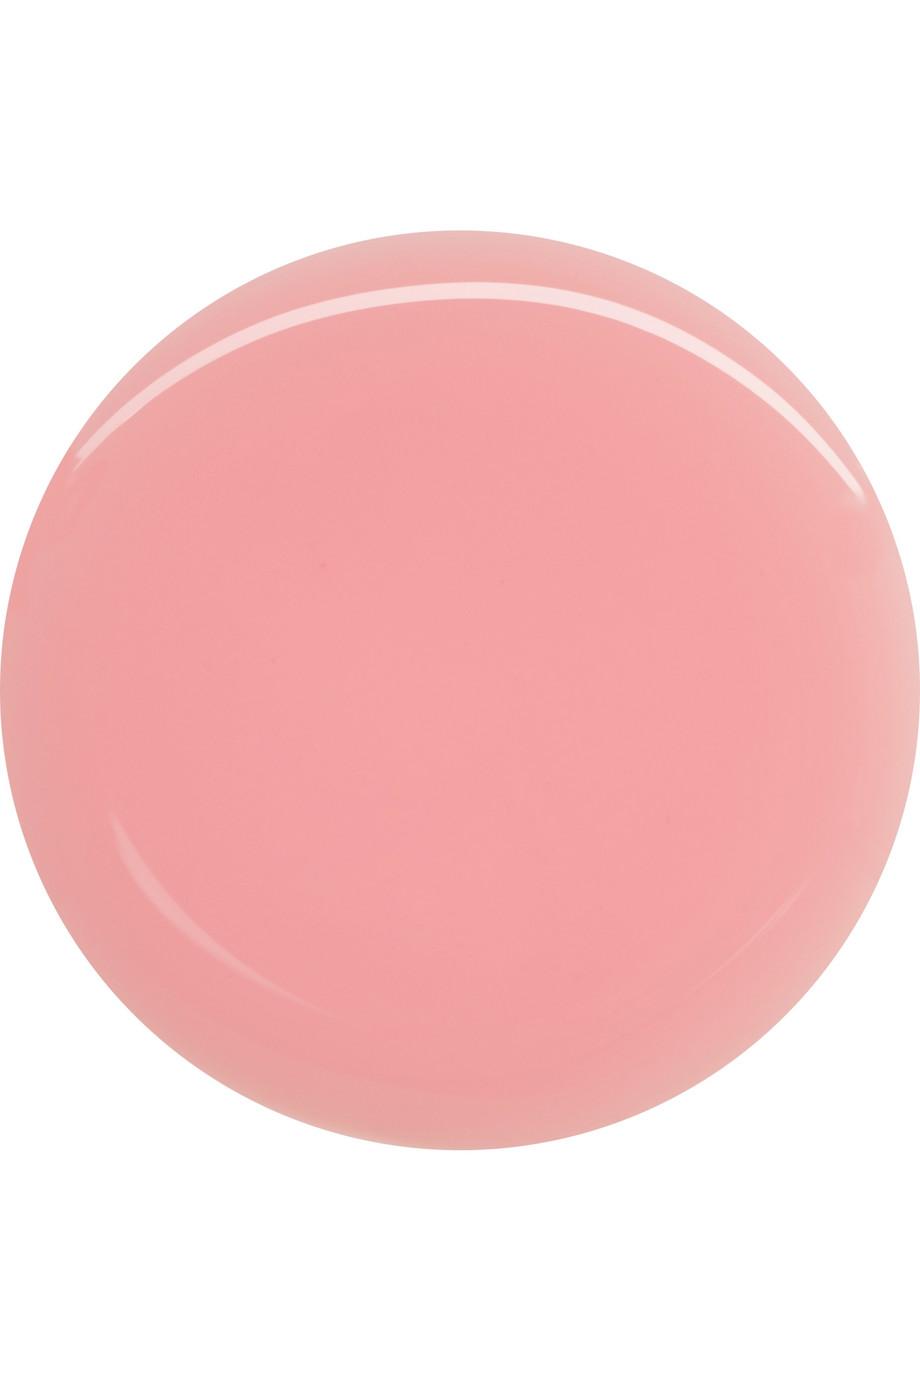 Deborah Lippmann Gel Lab Pro Nail Polish – Love at First Sight – Nagellack